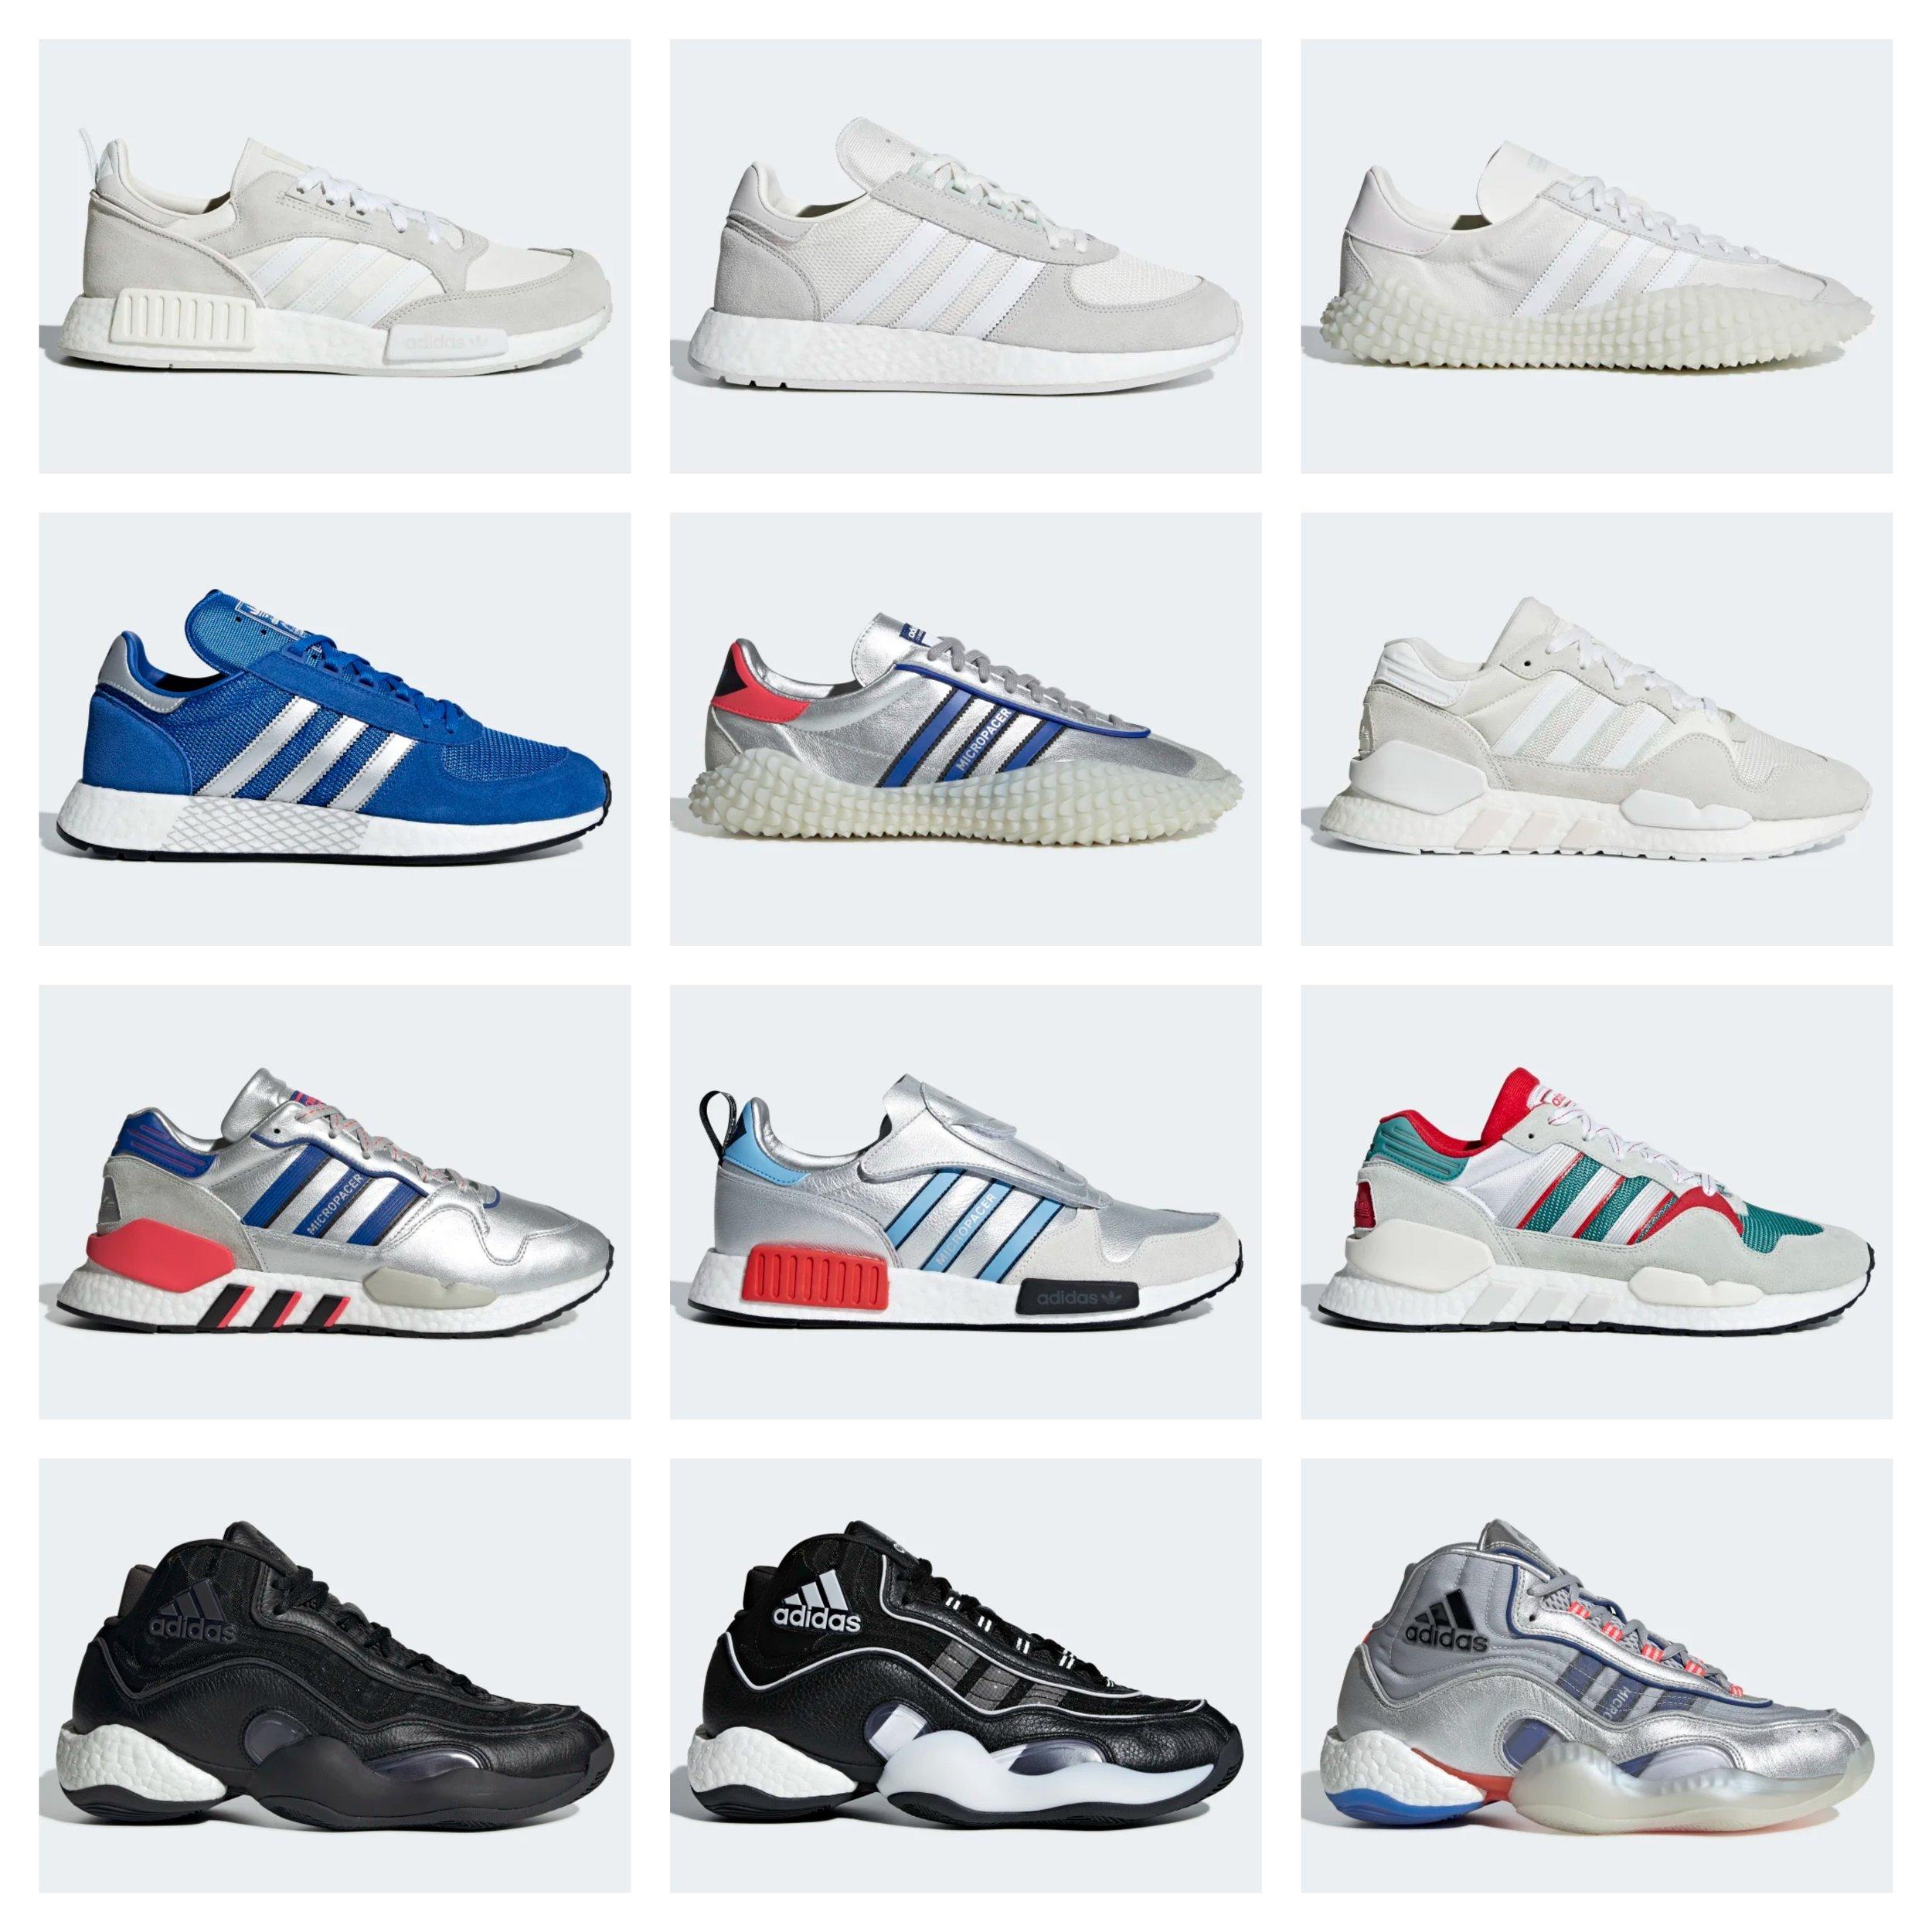 adidas-never-made.jpg